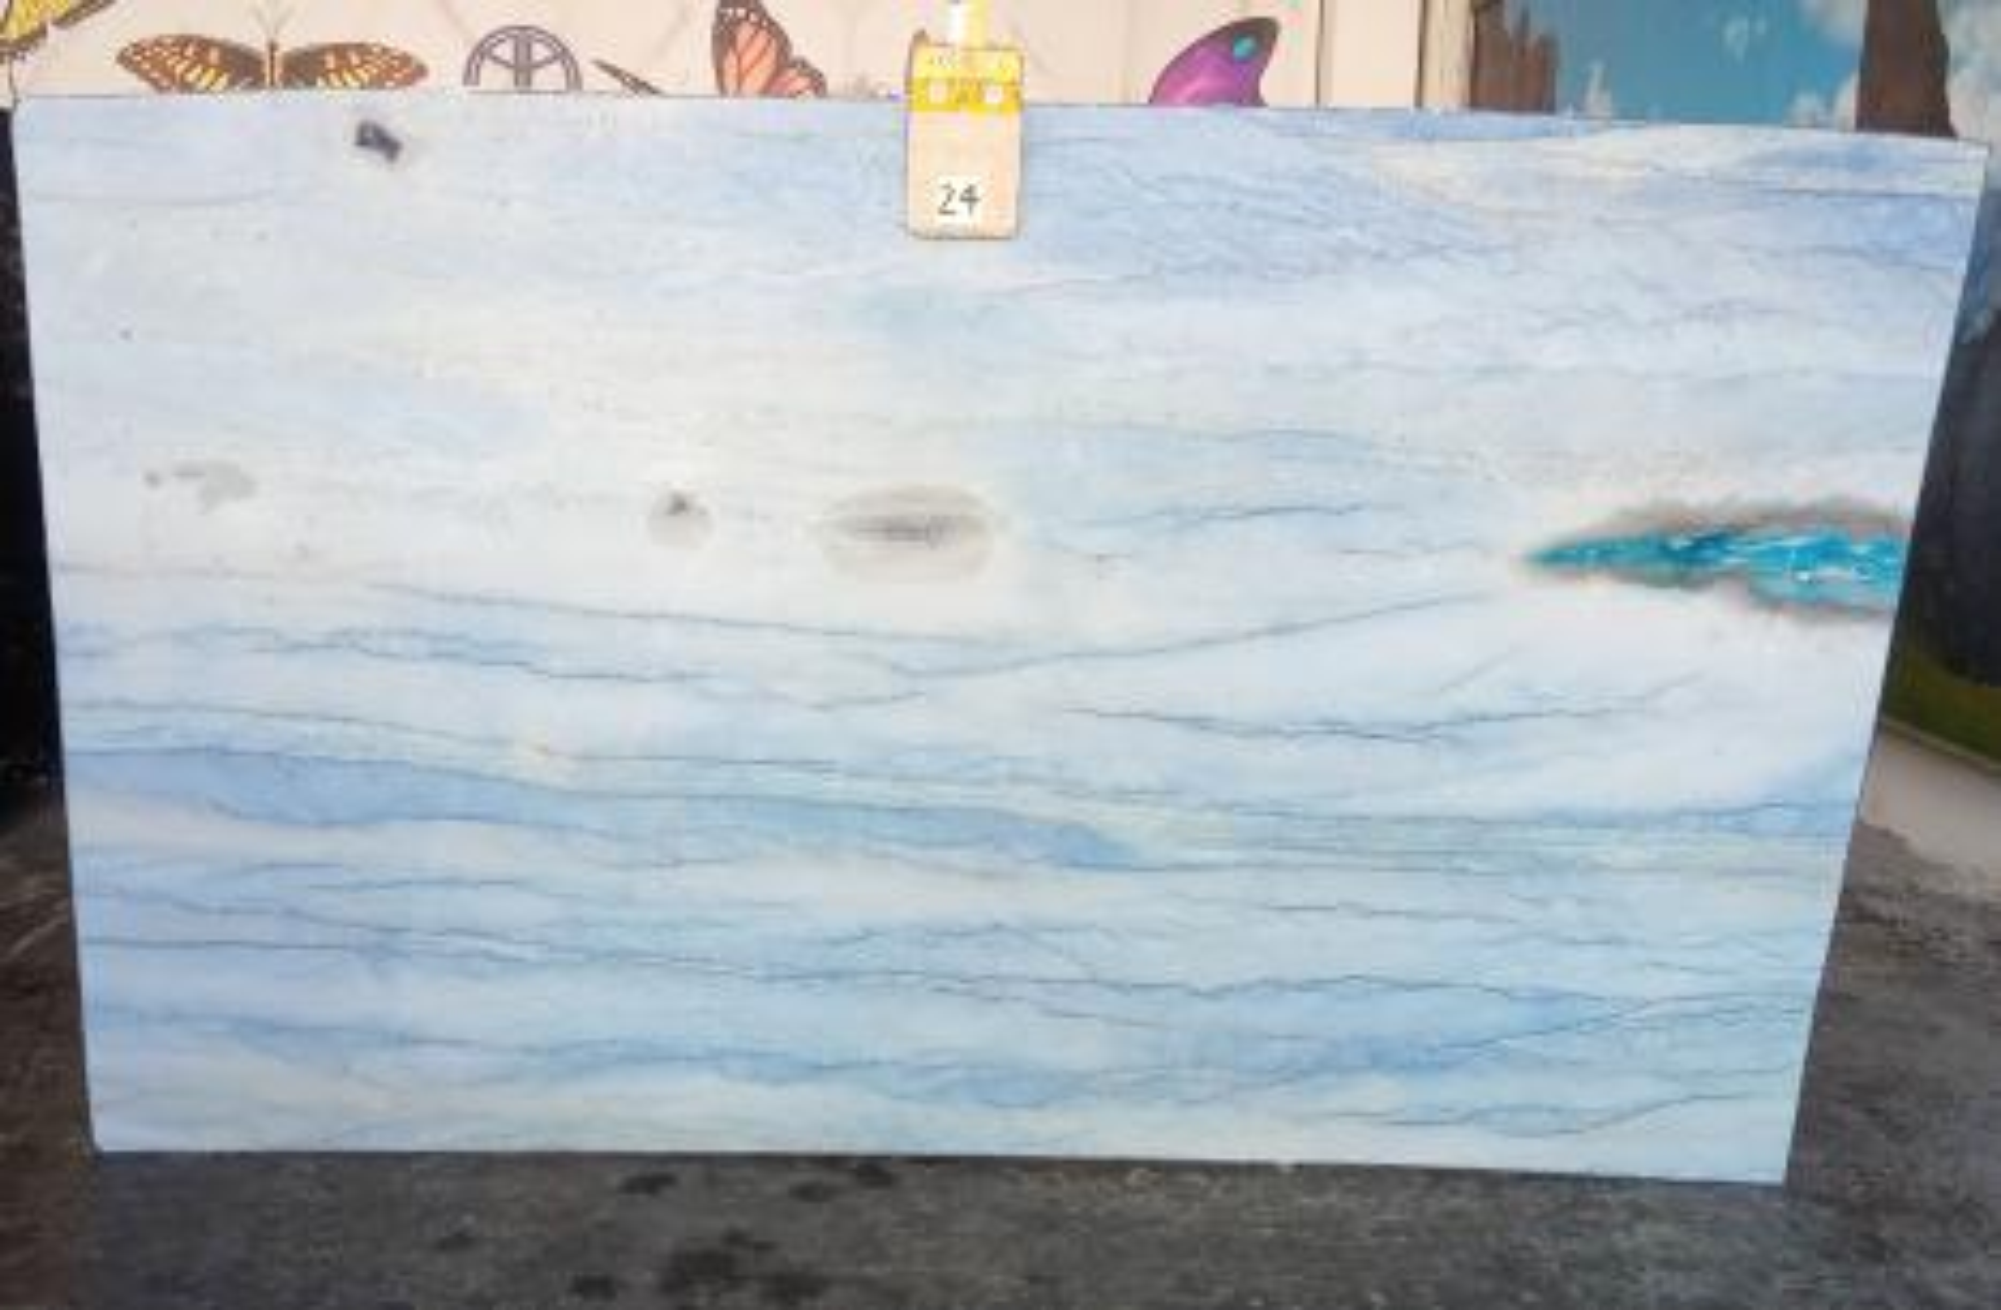 AZUL MAKAUBA polierte Unmaßplatten Z0191 aus Natur Marmor , Slab #24: Lieferung Veneto, Italien